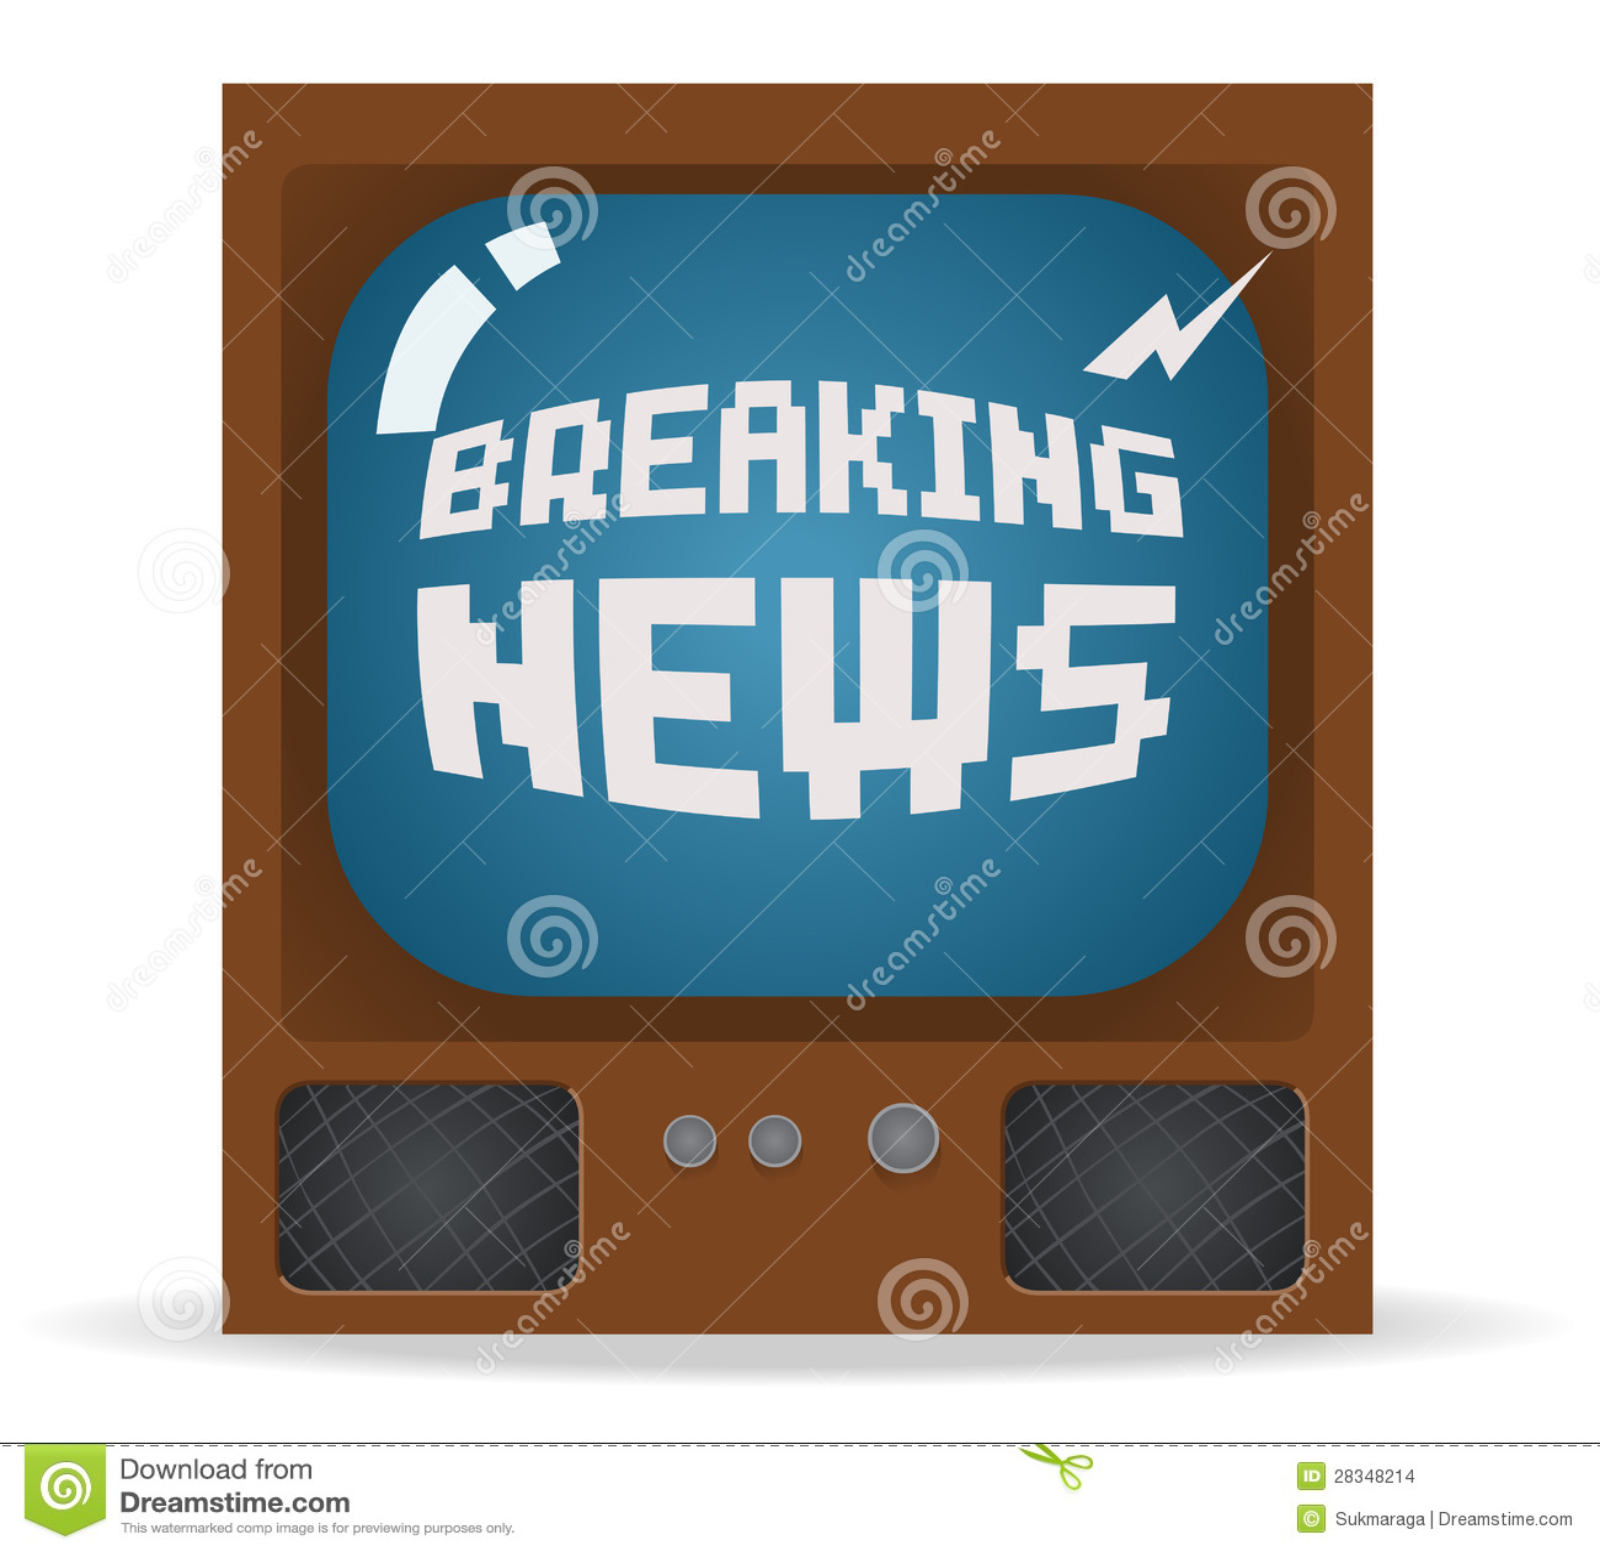 Breaking News: Breaking News Stock Images